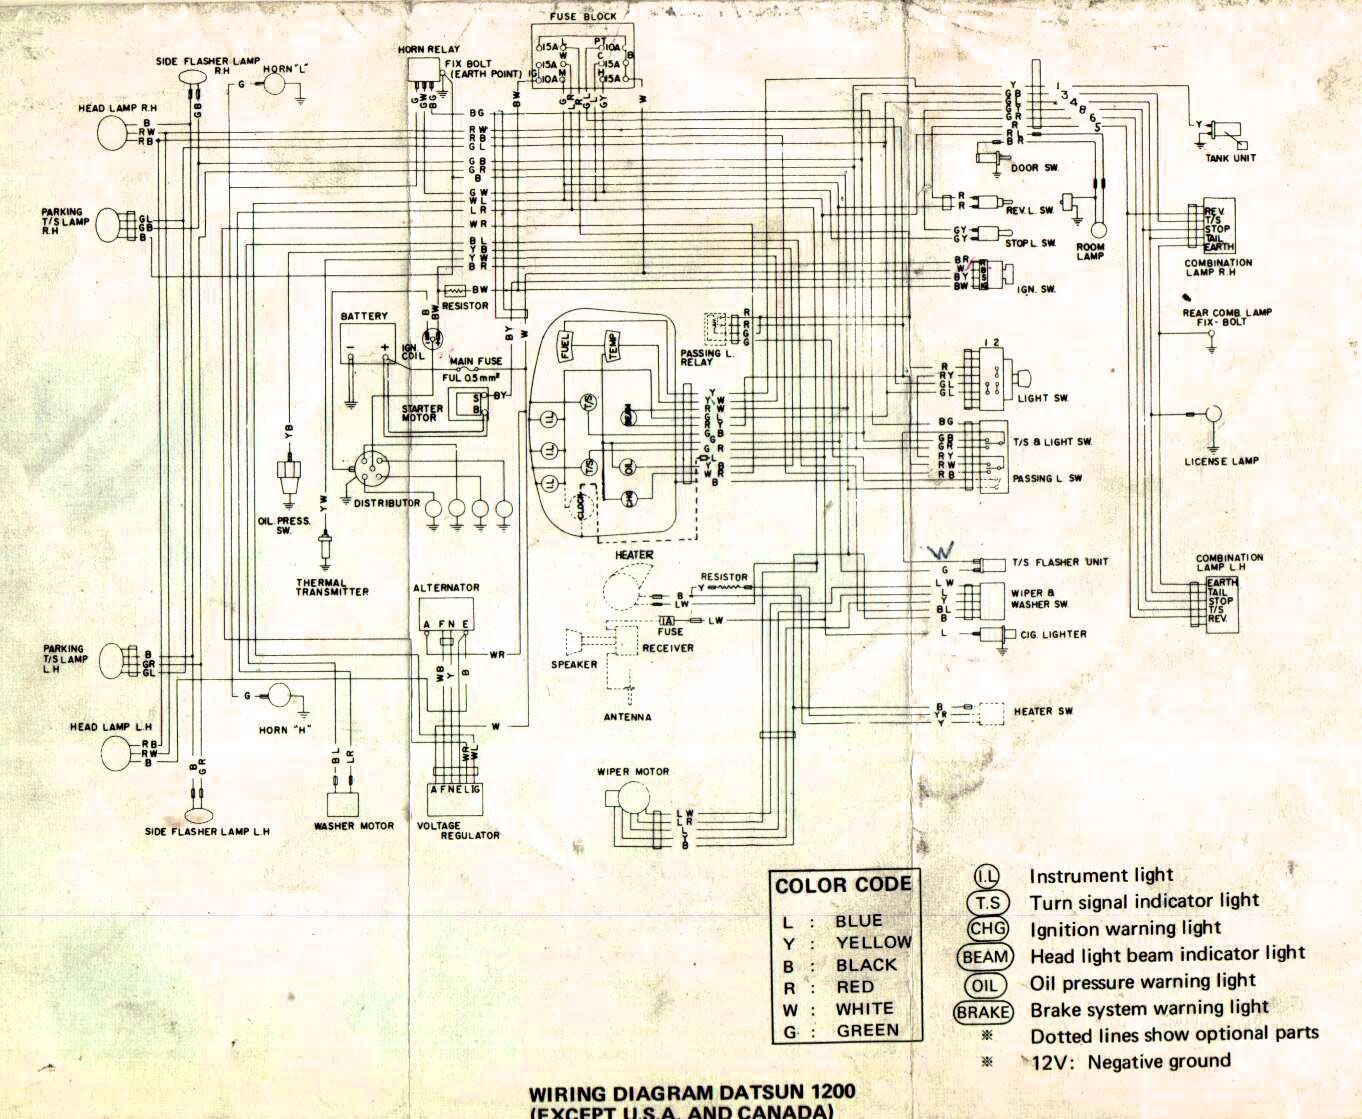 nissan 1400 wiring diagram wiring diagram dat nissan 1400 coil wiring diagram nissan 1400 wiring diagram [ 1362 x 1119 Pixel ]